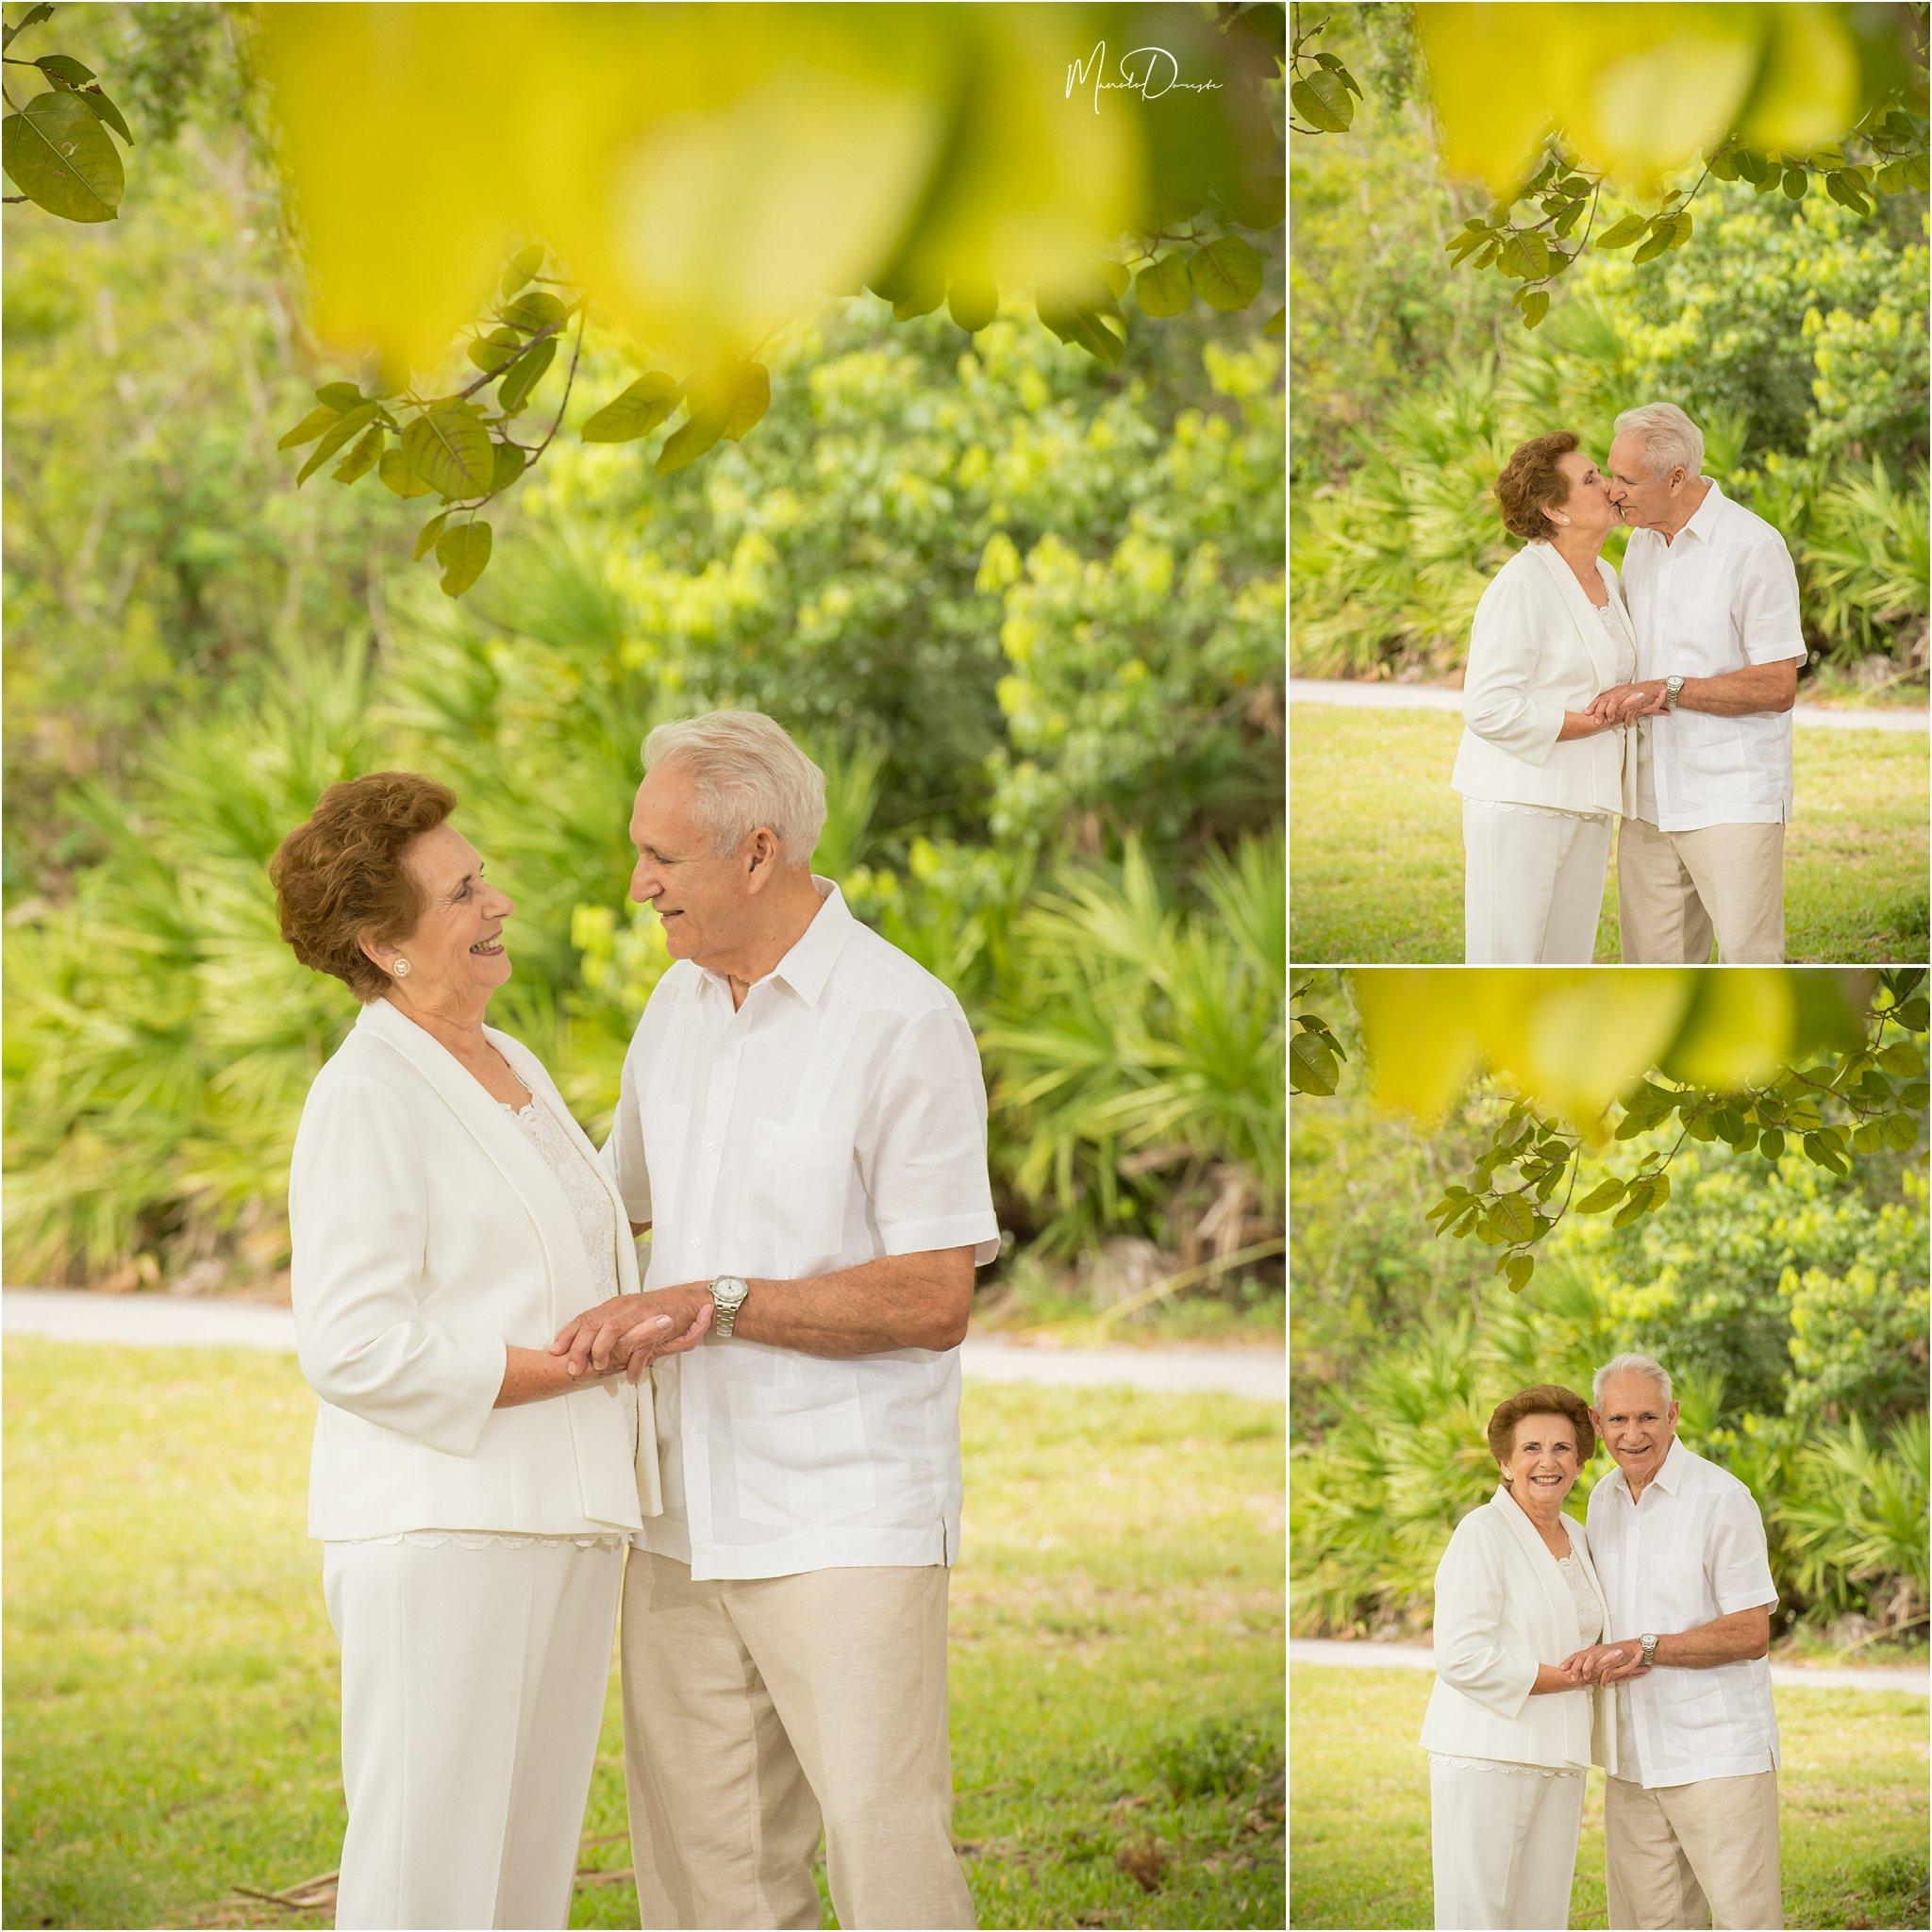 0556_ManoloDoreste_InFocusStudios_Wedding_Family_Photography_Miami_MiamiPhotographer.jpg